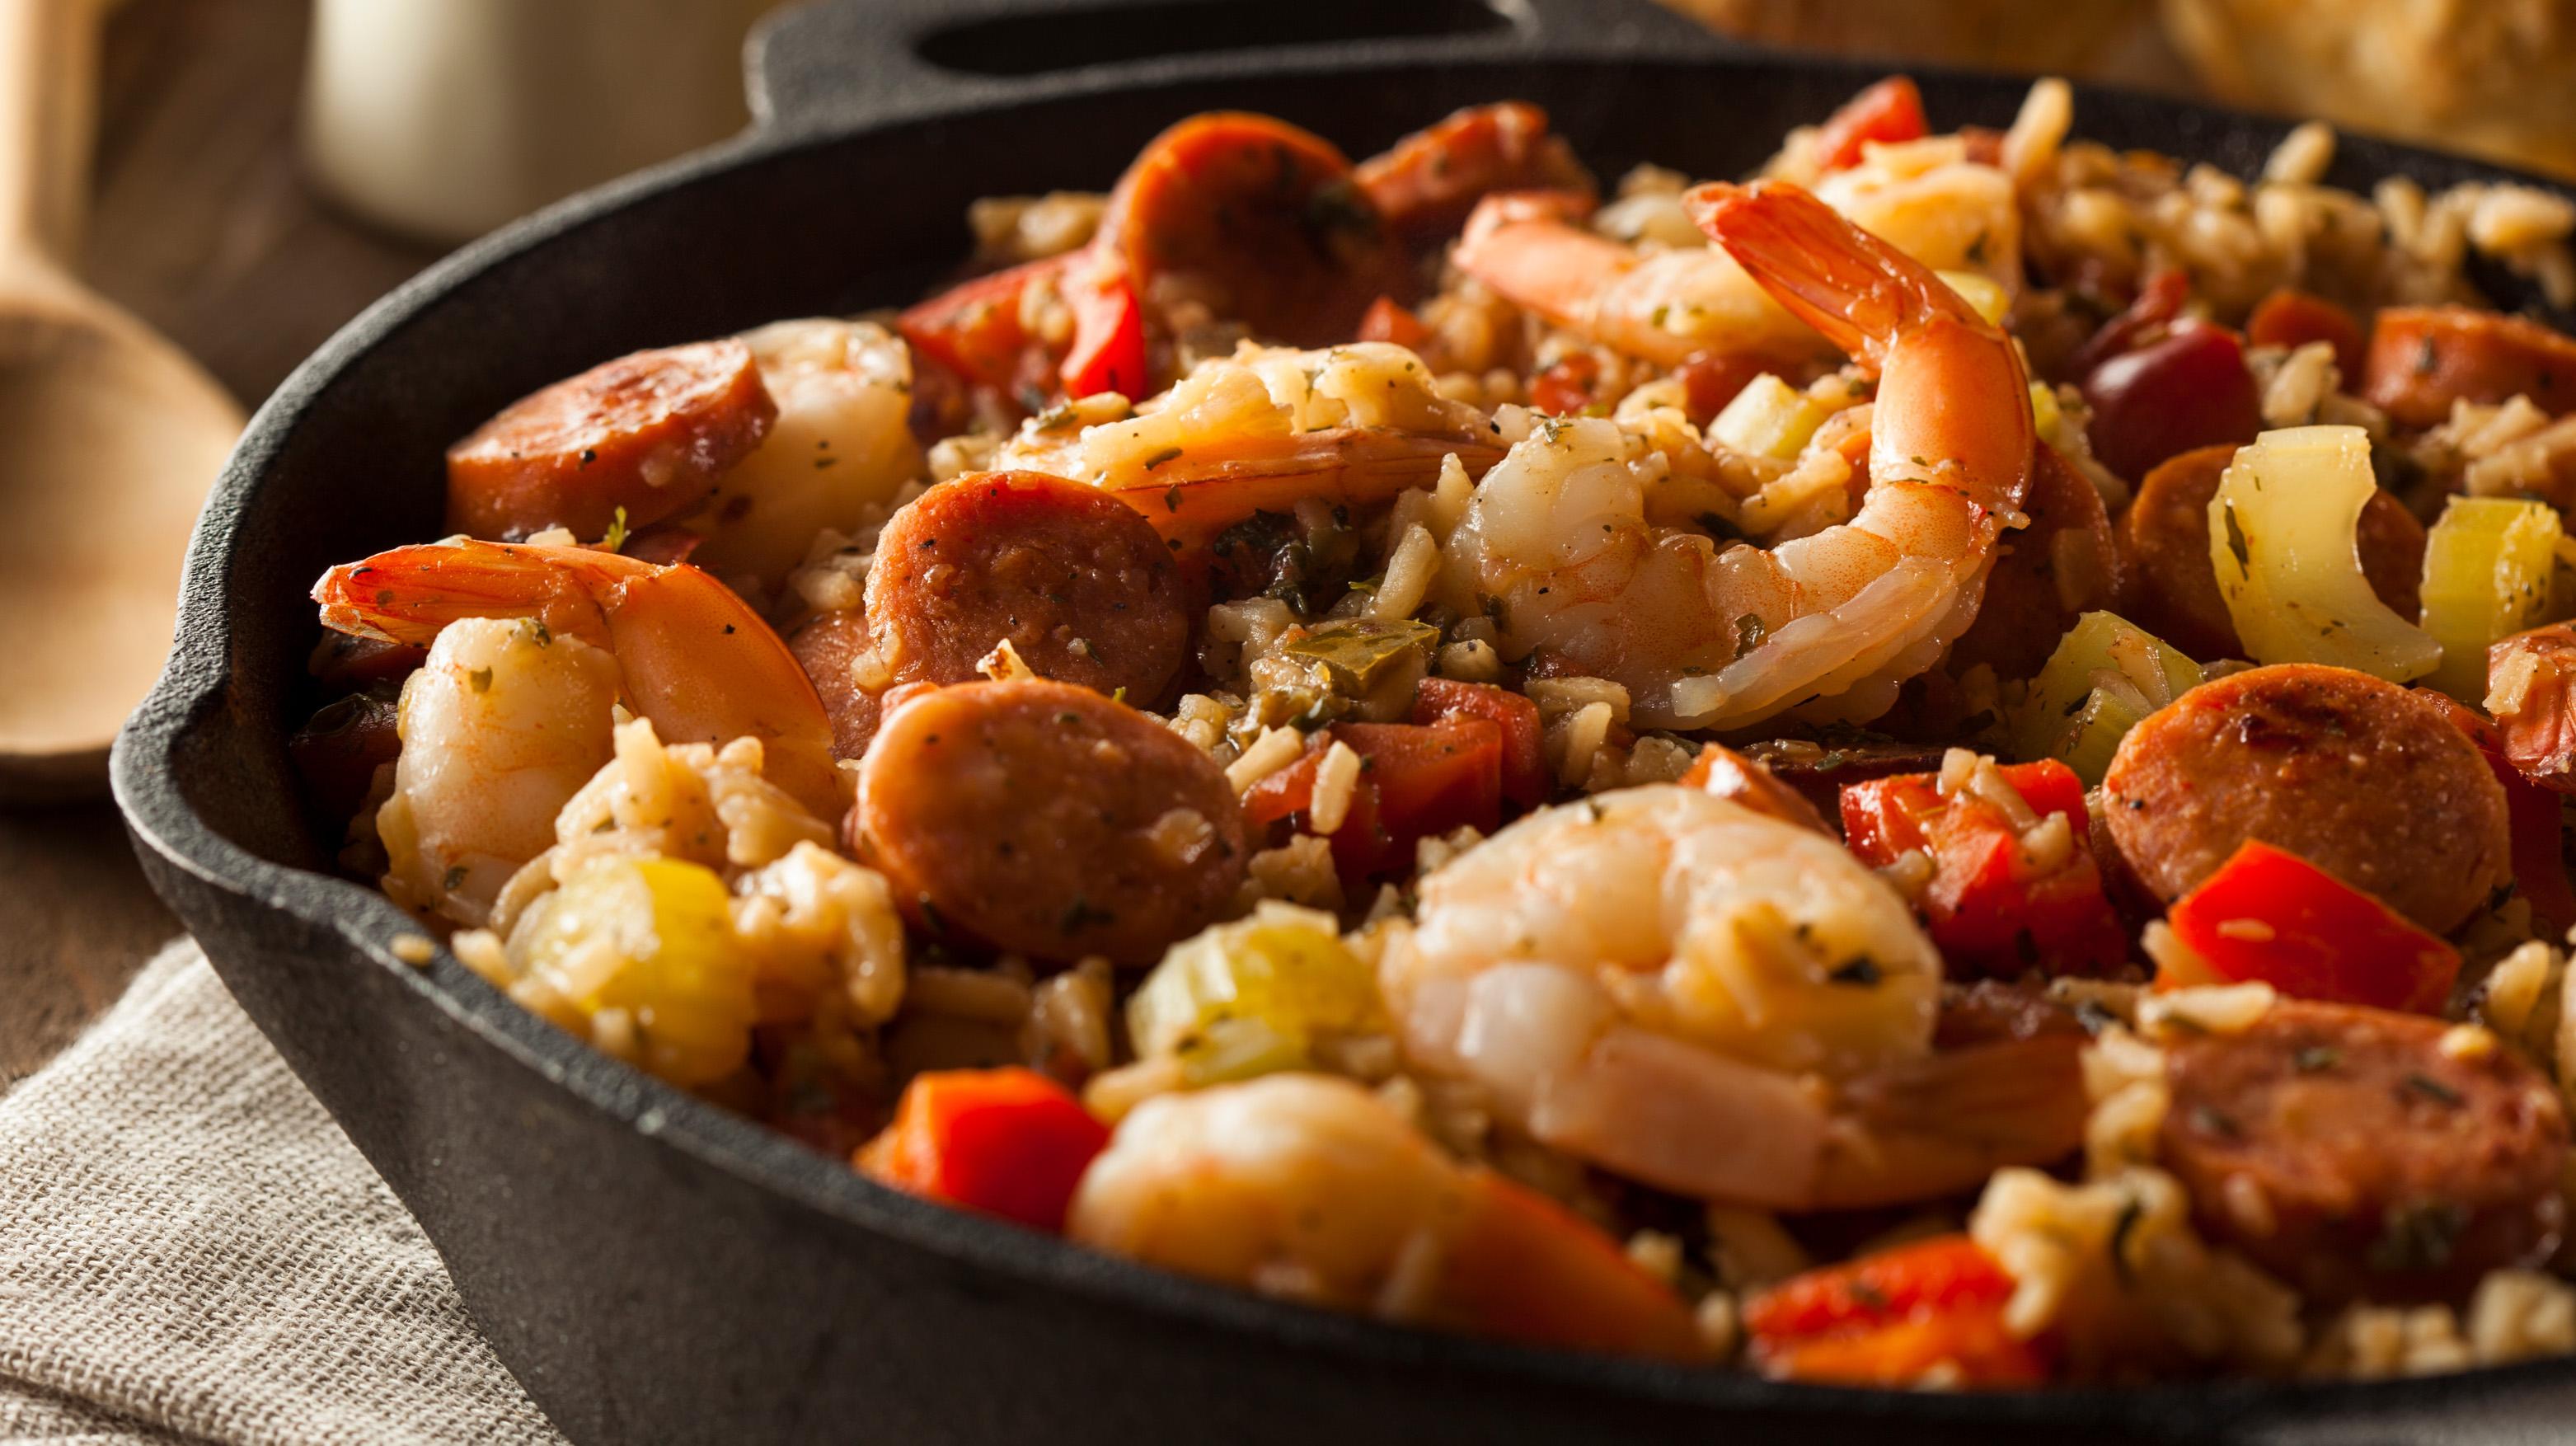 Creole Lunch Buffet - Kolekole Bar & Grill